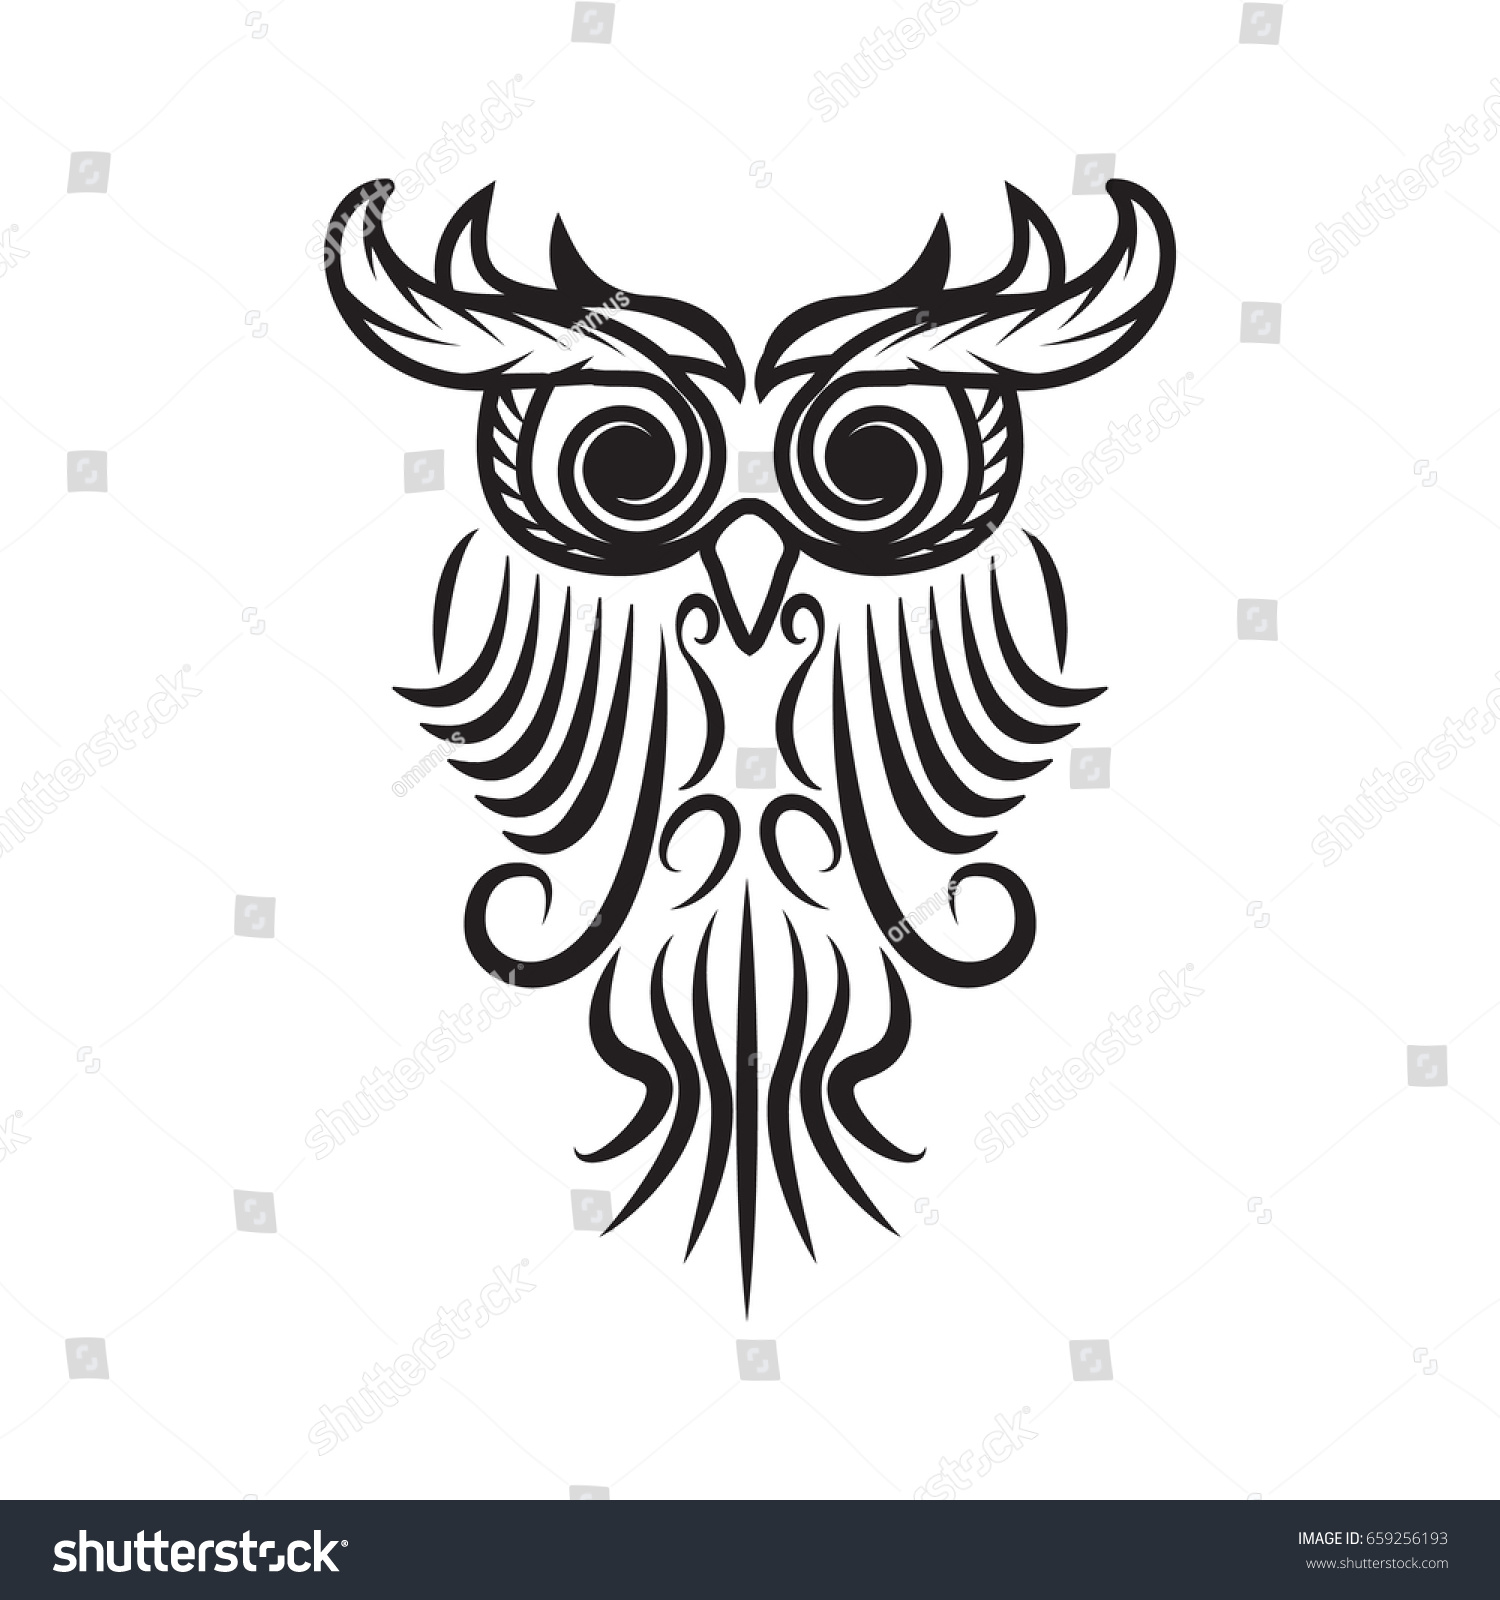 Owl Tribal Owl Tatto Owl Stock Vector (Royalty Free) 659256193 ...